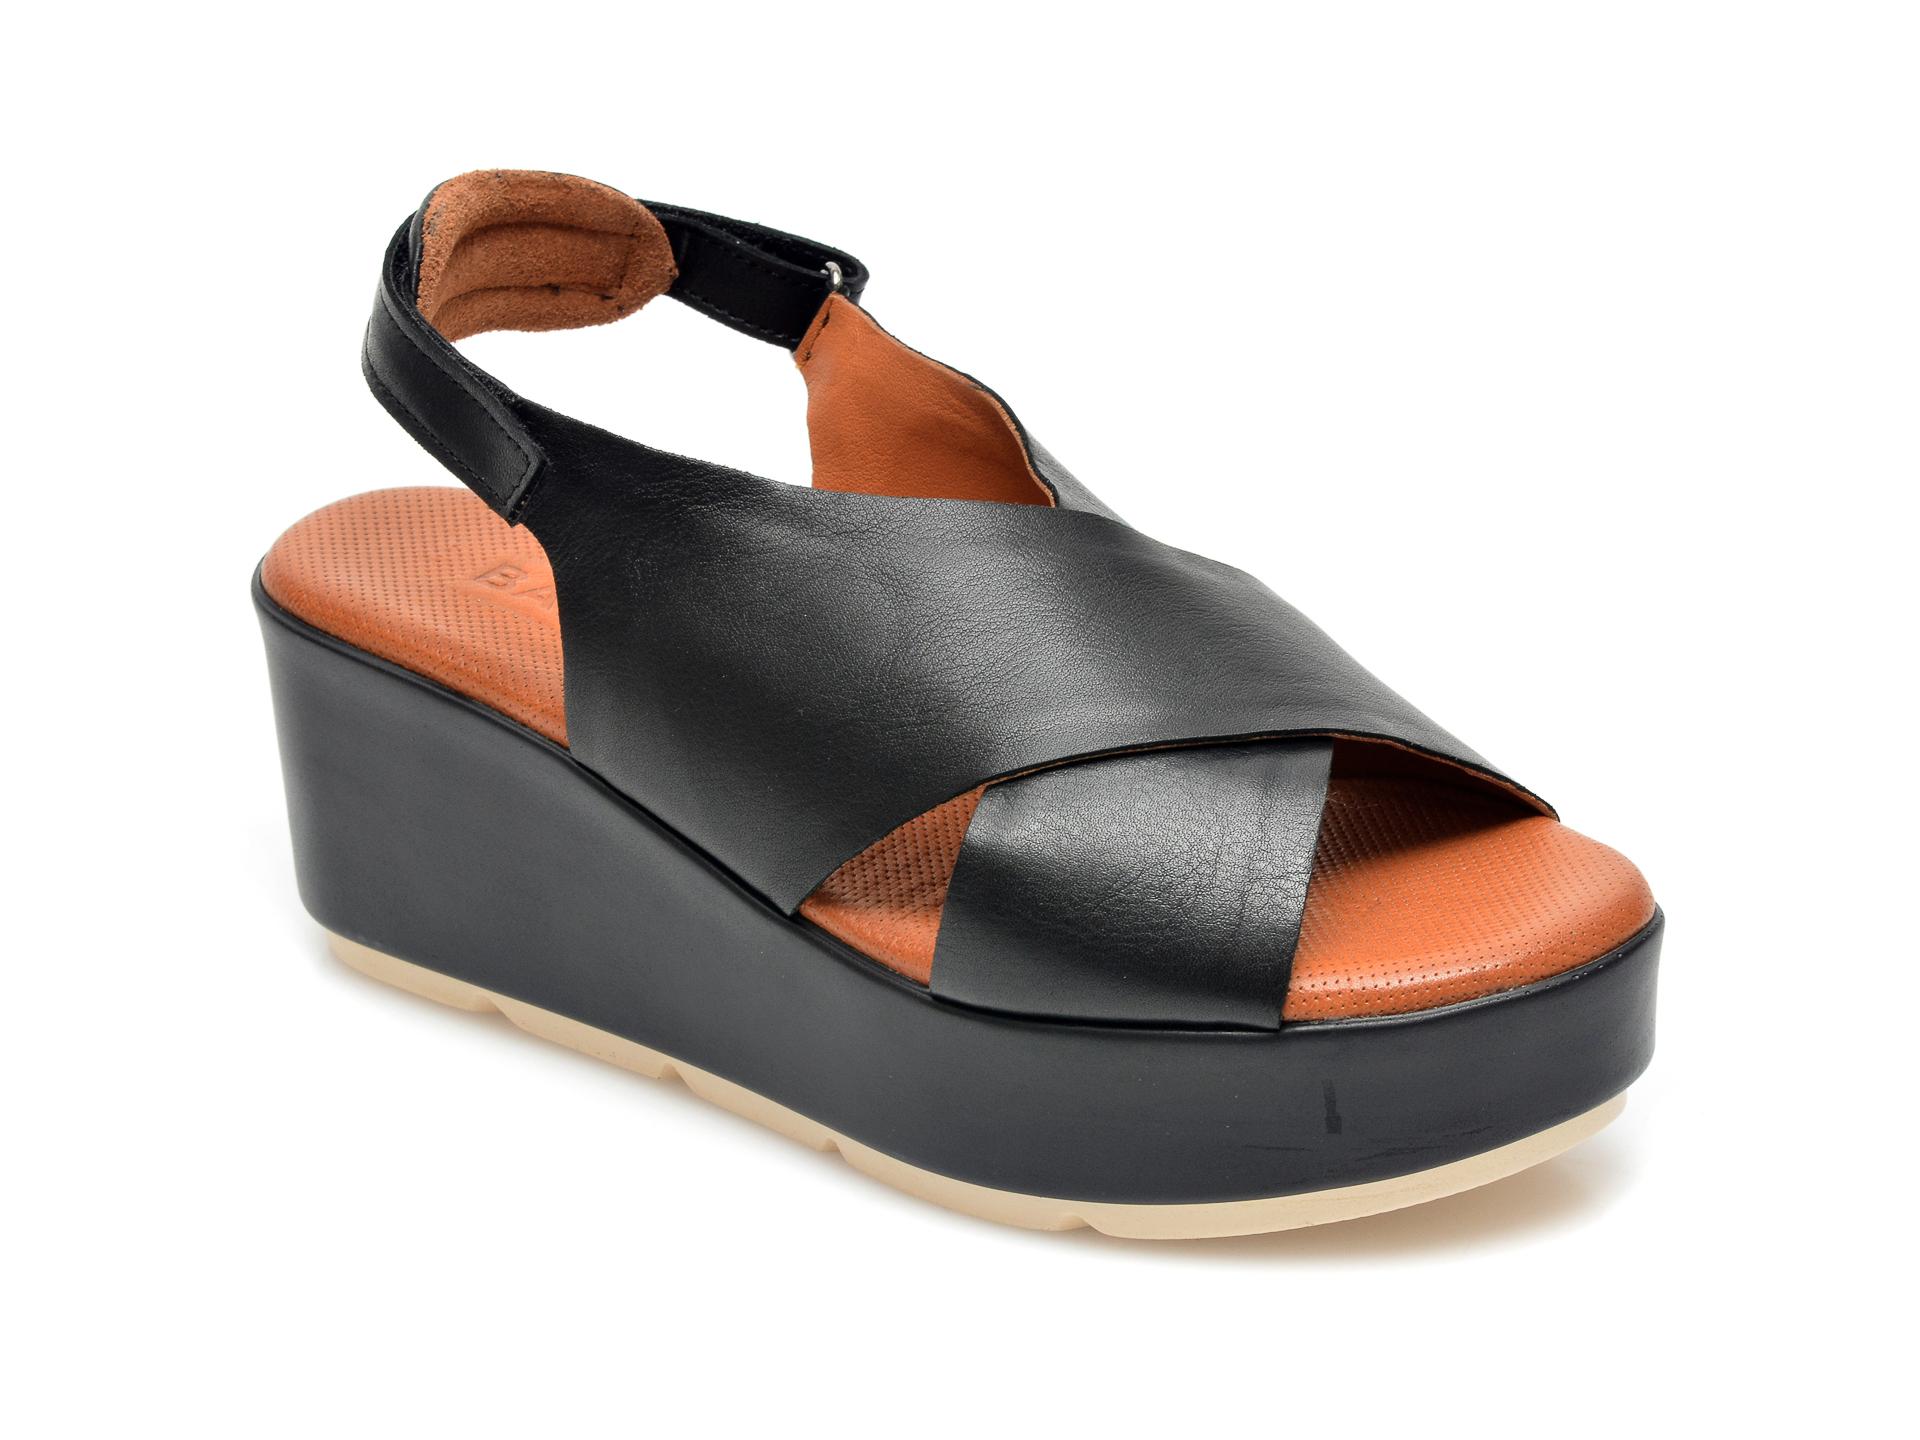 Sandale BABOOS negre, 2520, din piele naturala imagine otter.ro